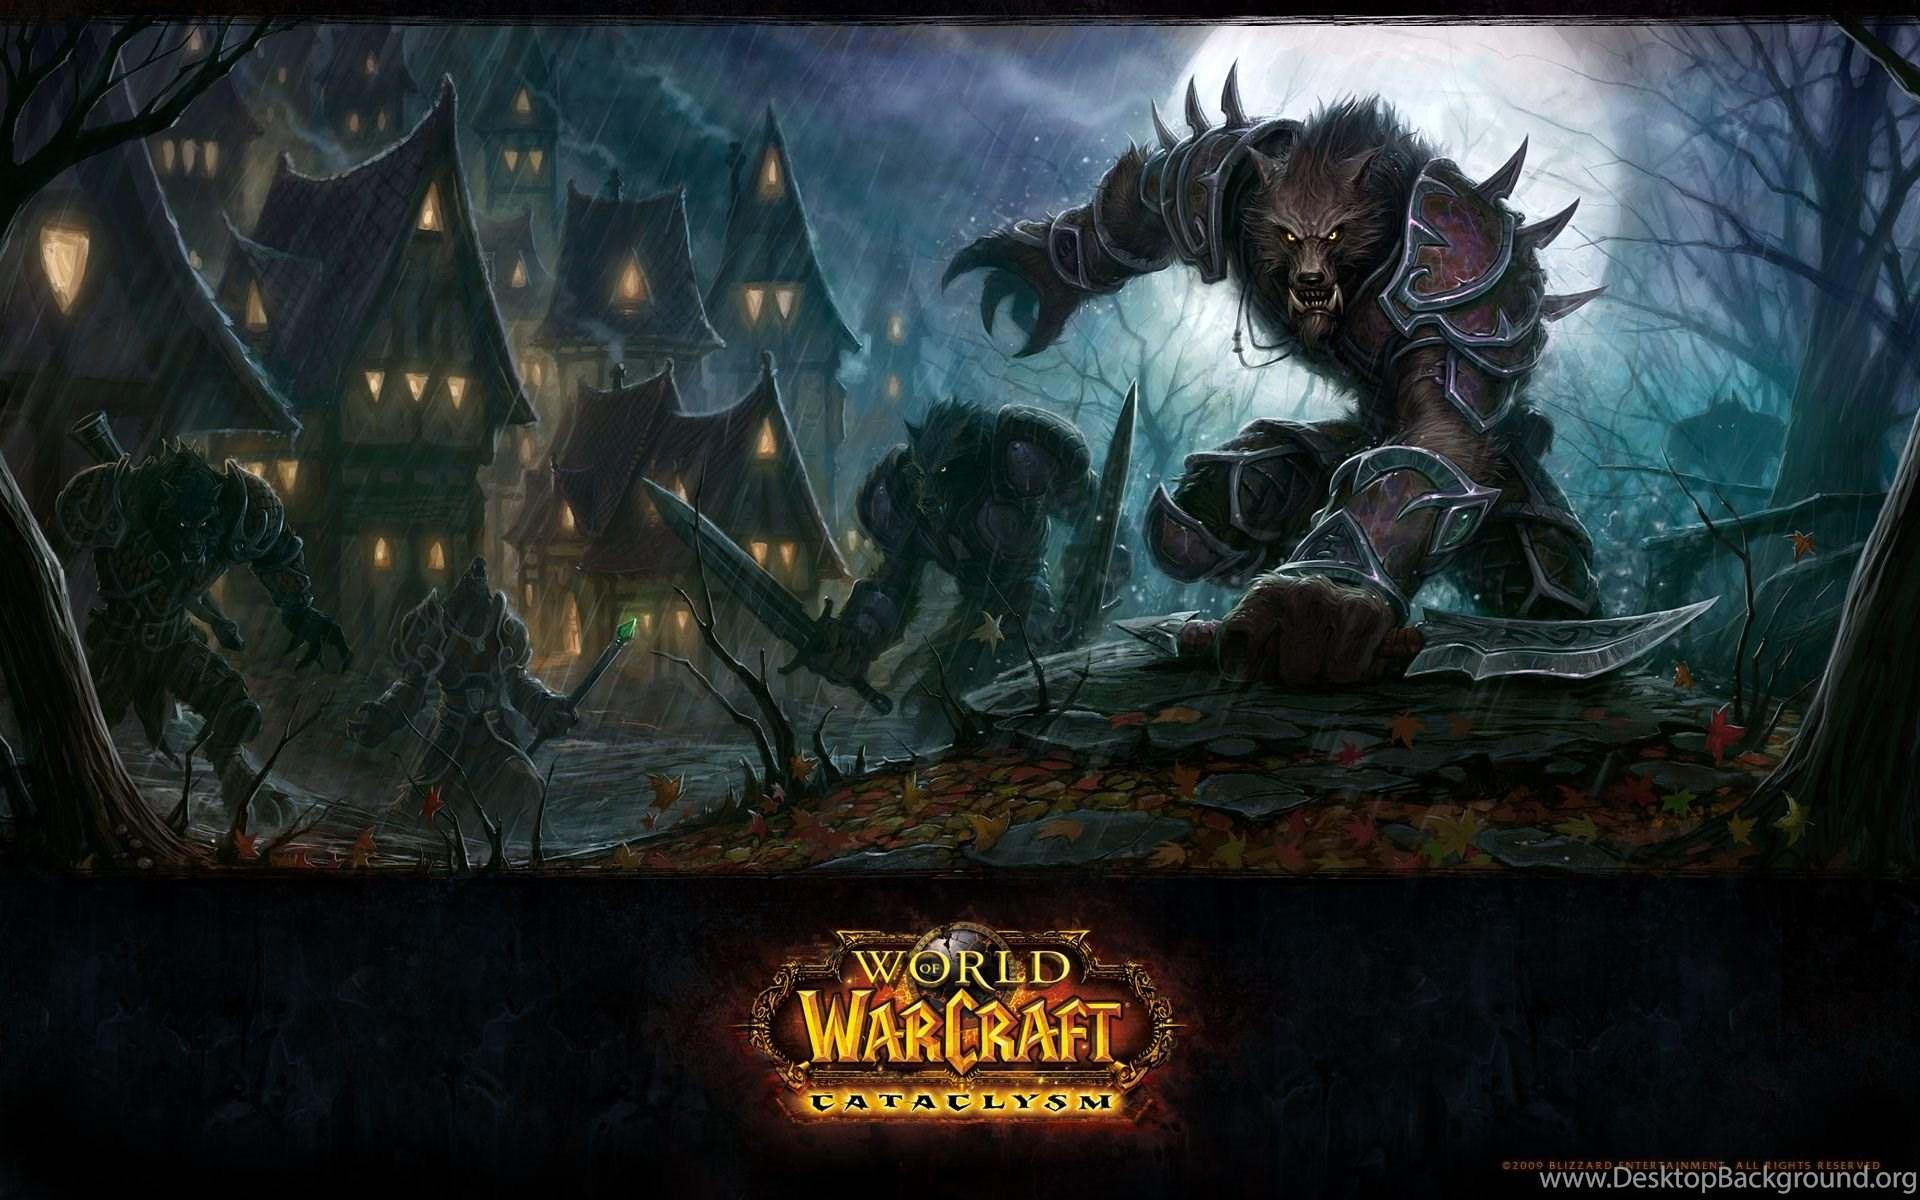 World Of Warcraft Cataclysm Wallpaper Hd I3 Jpg Desktop Background